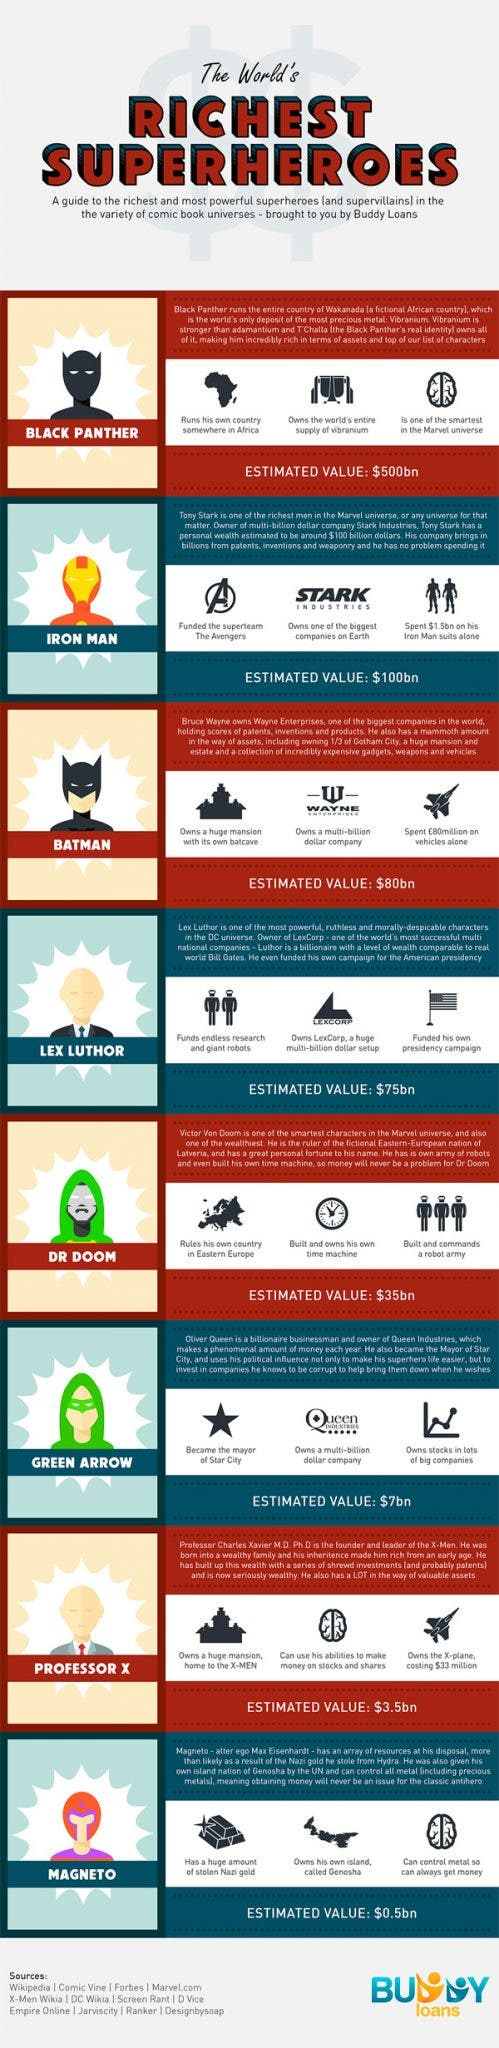 infografia-millonarios